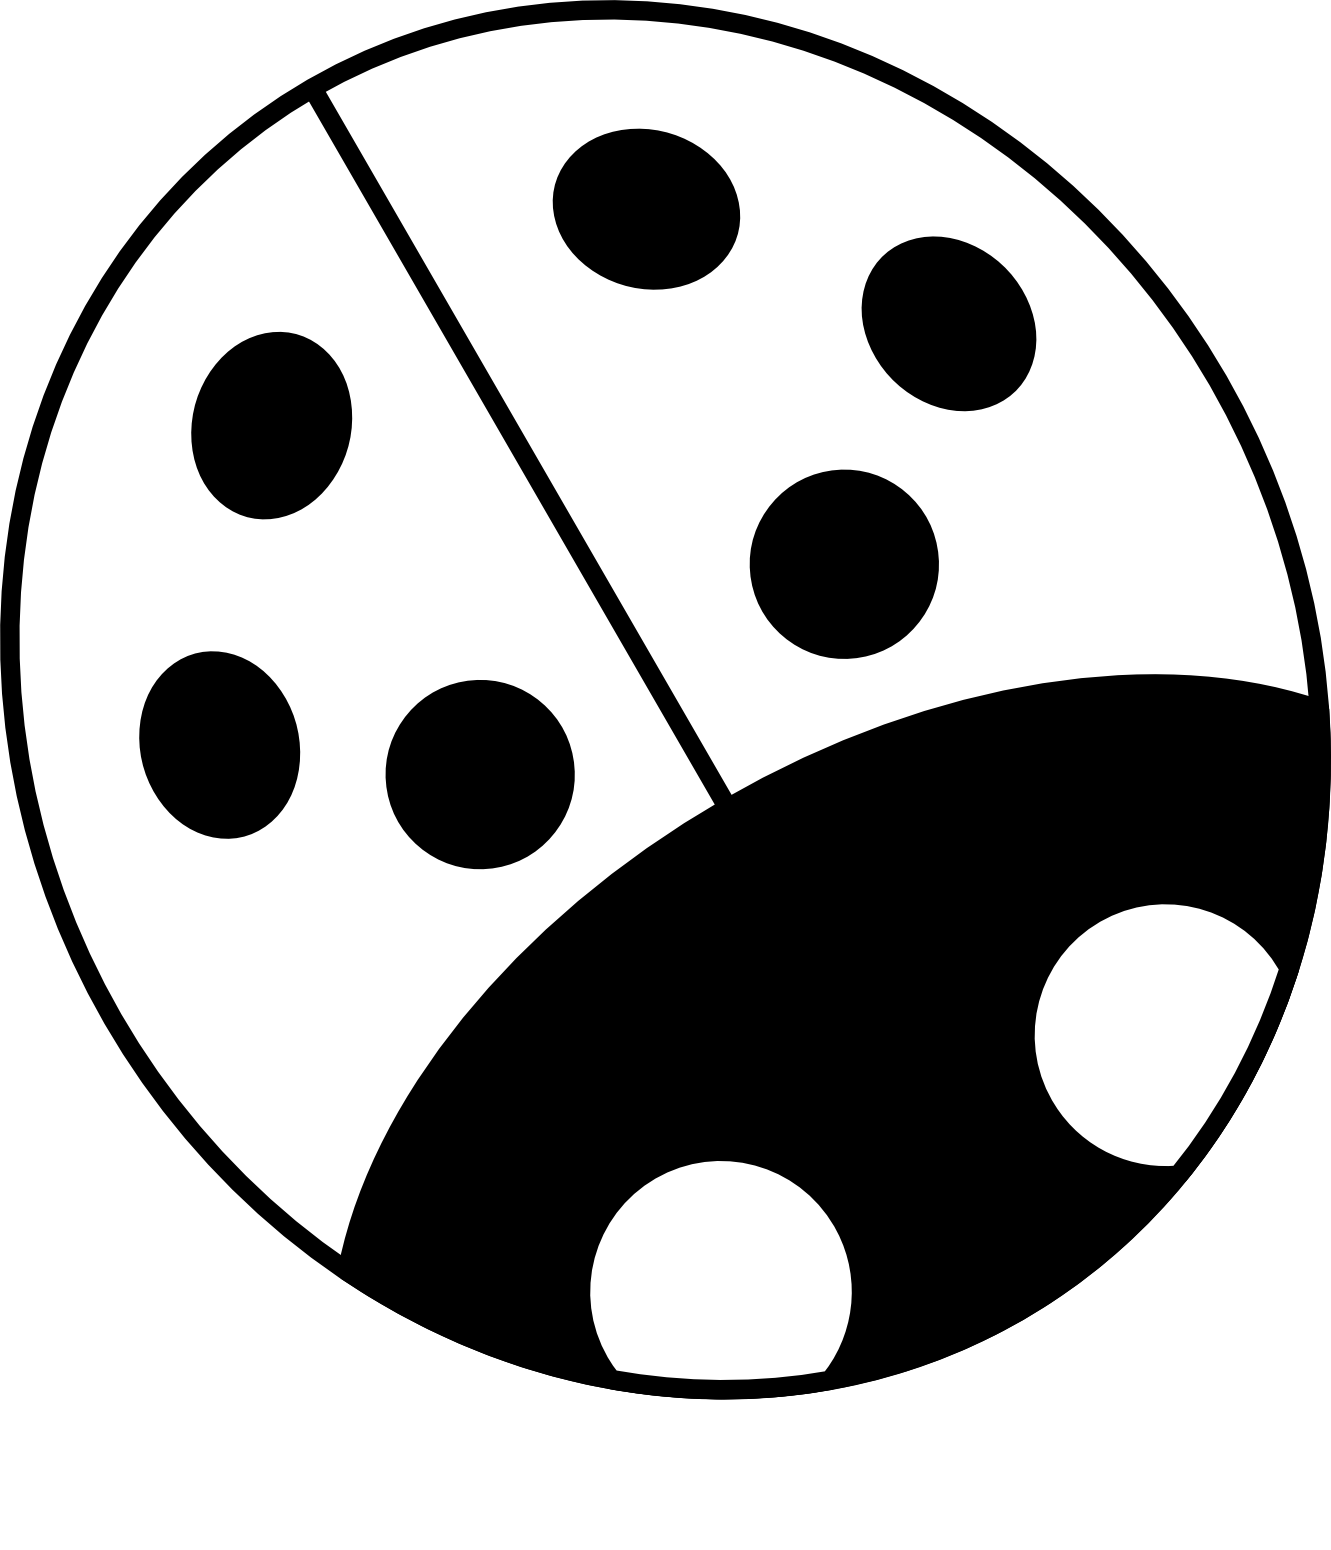 1331x1550 Ladybug Clipart Outline